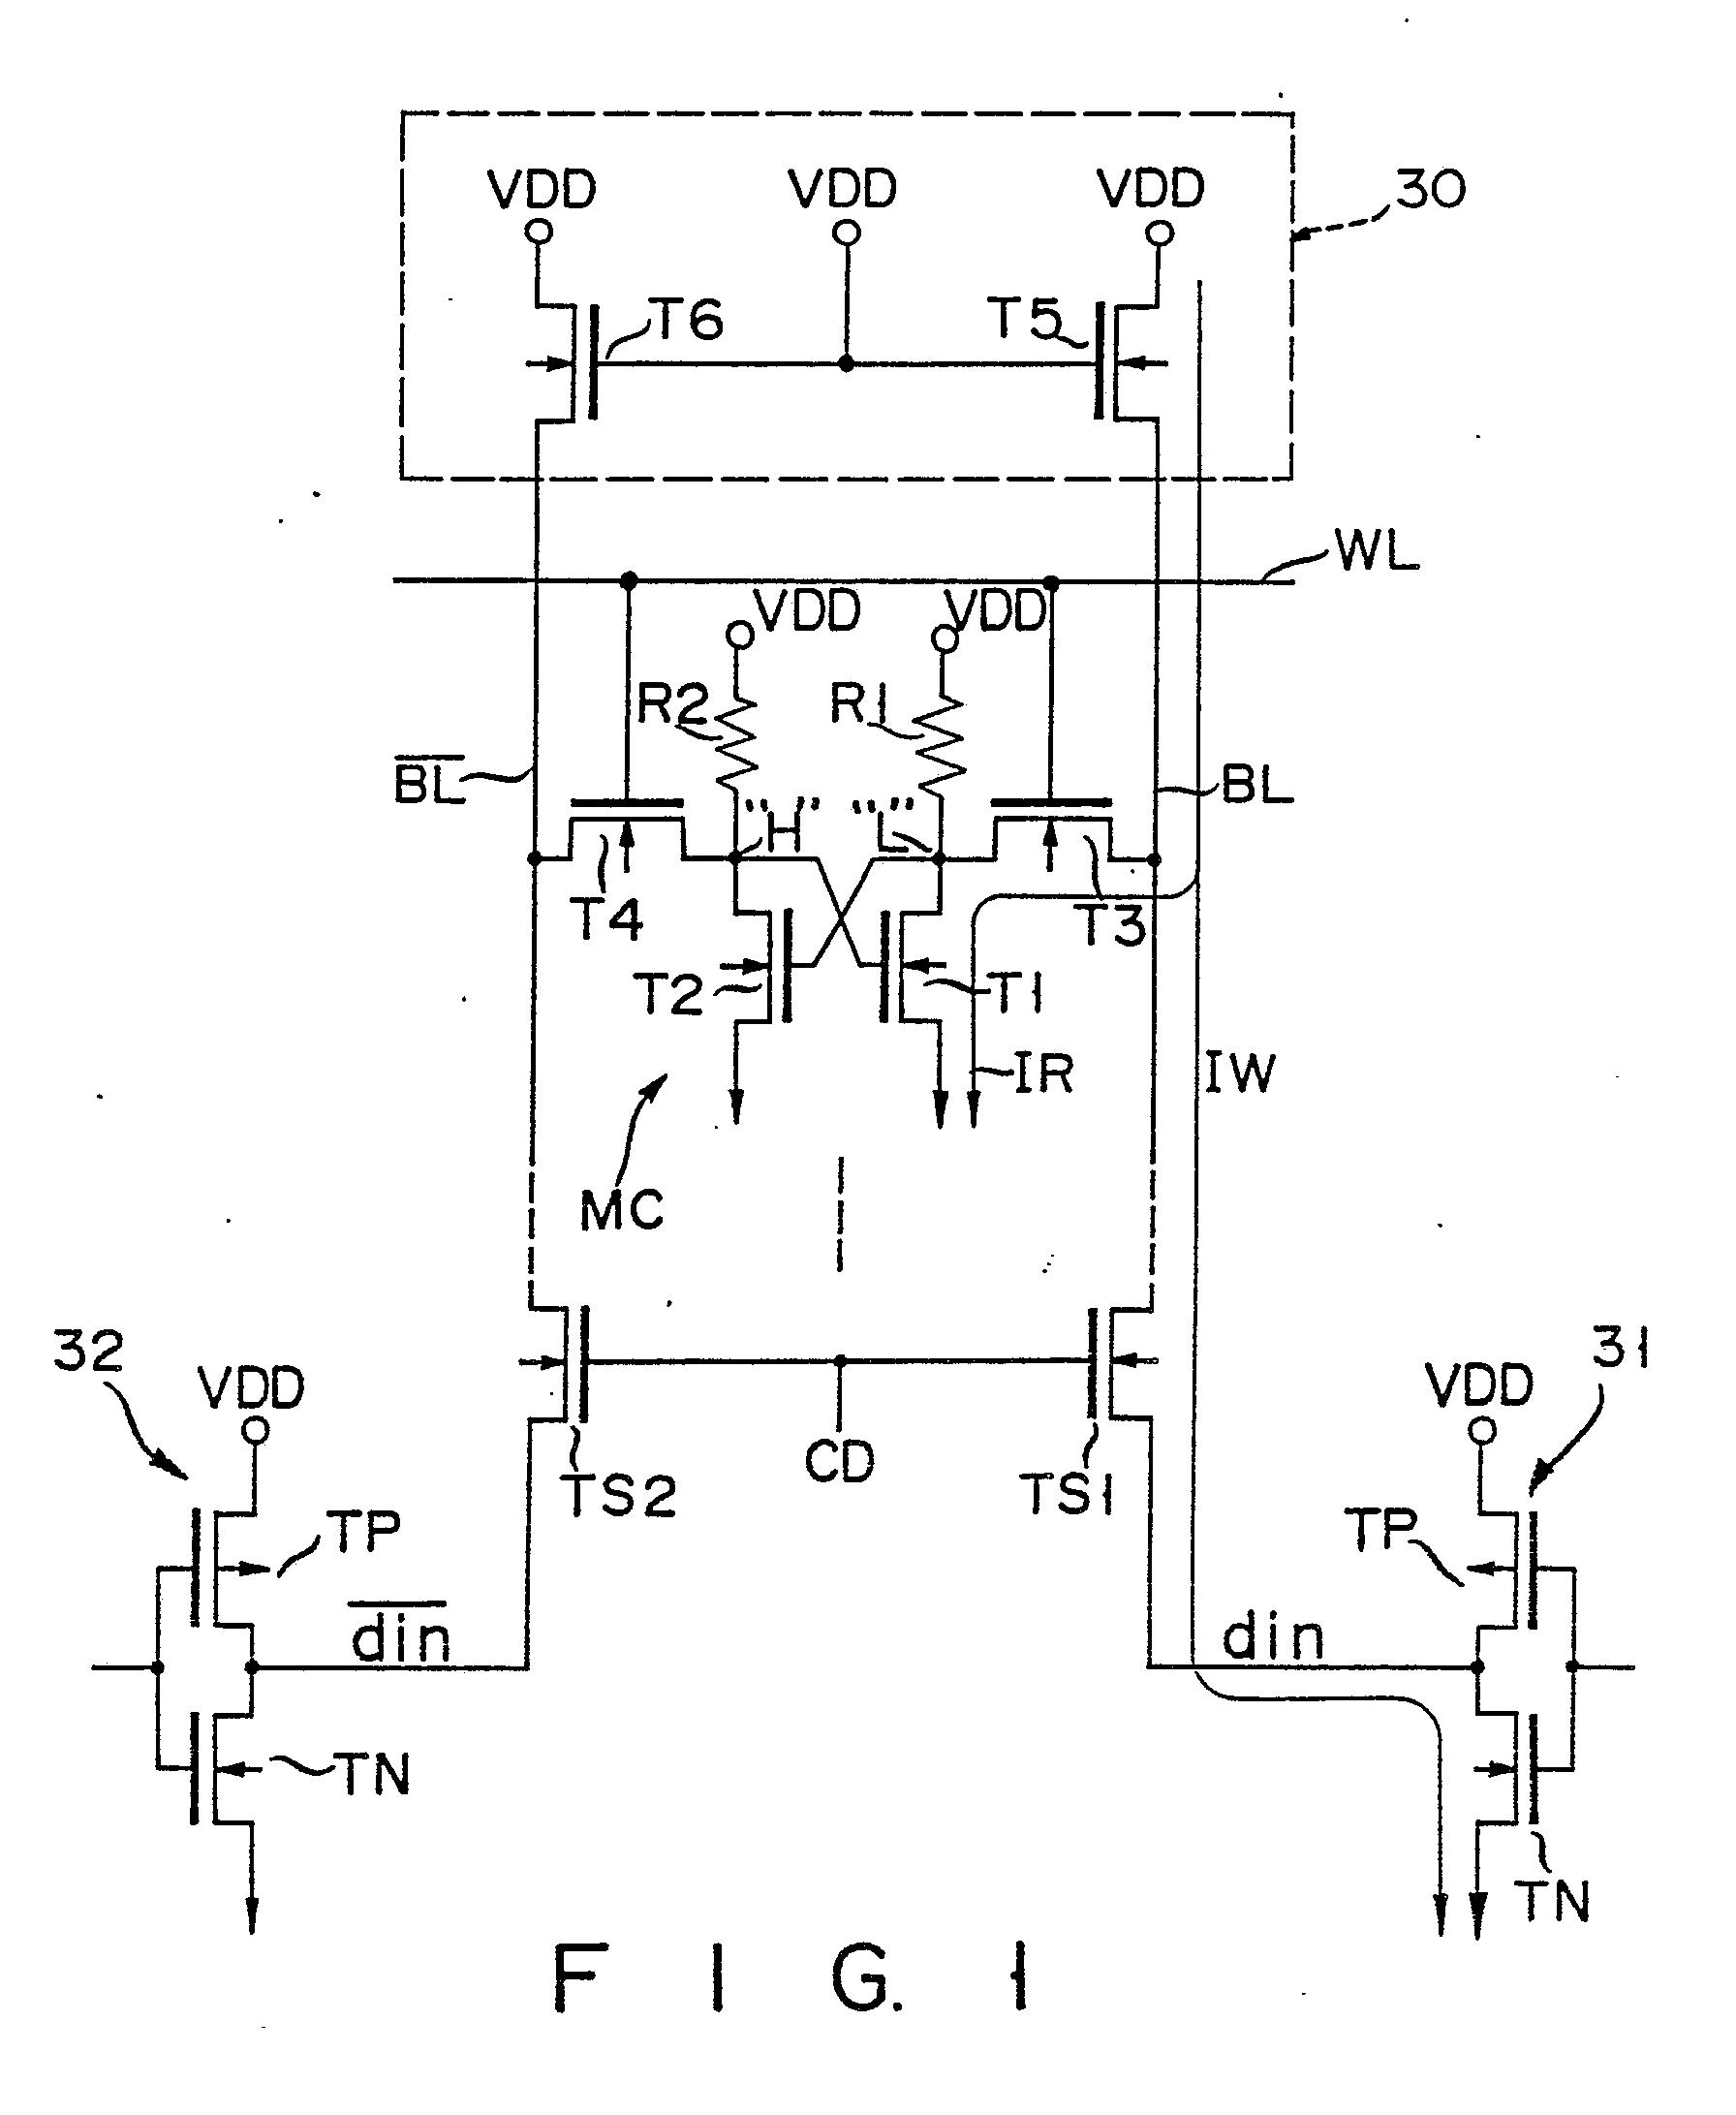 semiconductor sram device